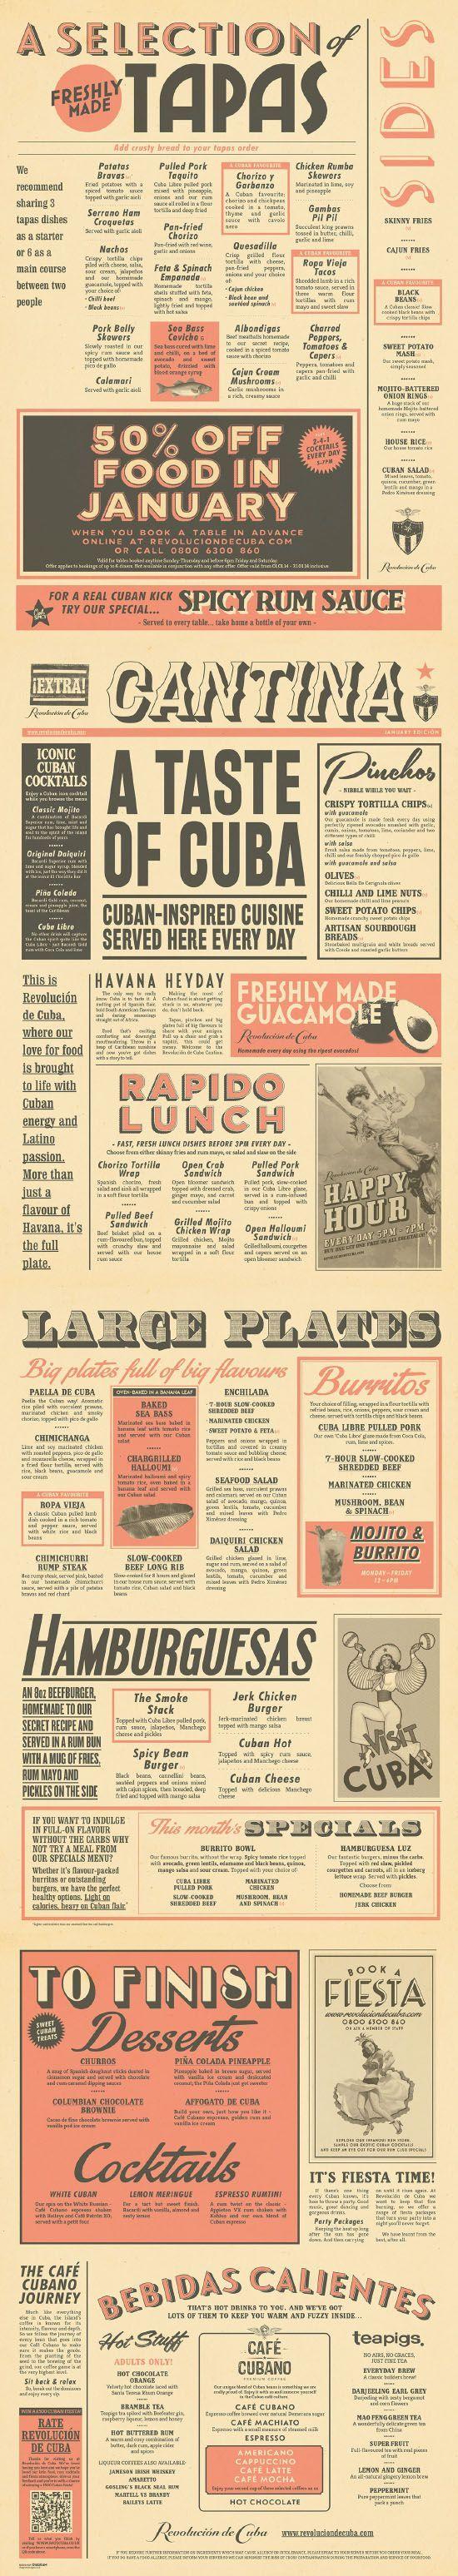 Food infographic  Cuban Cantina Food Menu Graphic Design for Revolucion de Cuba by